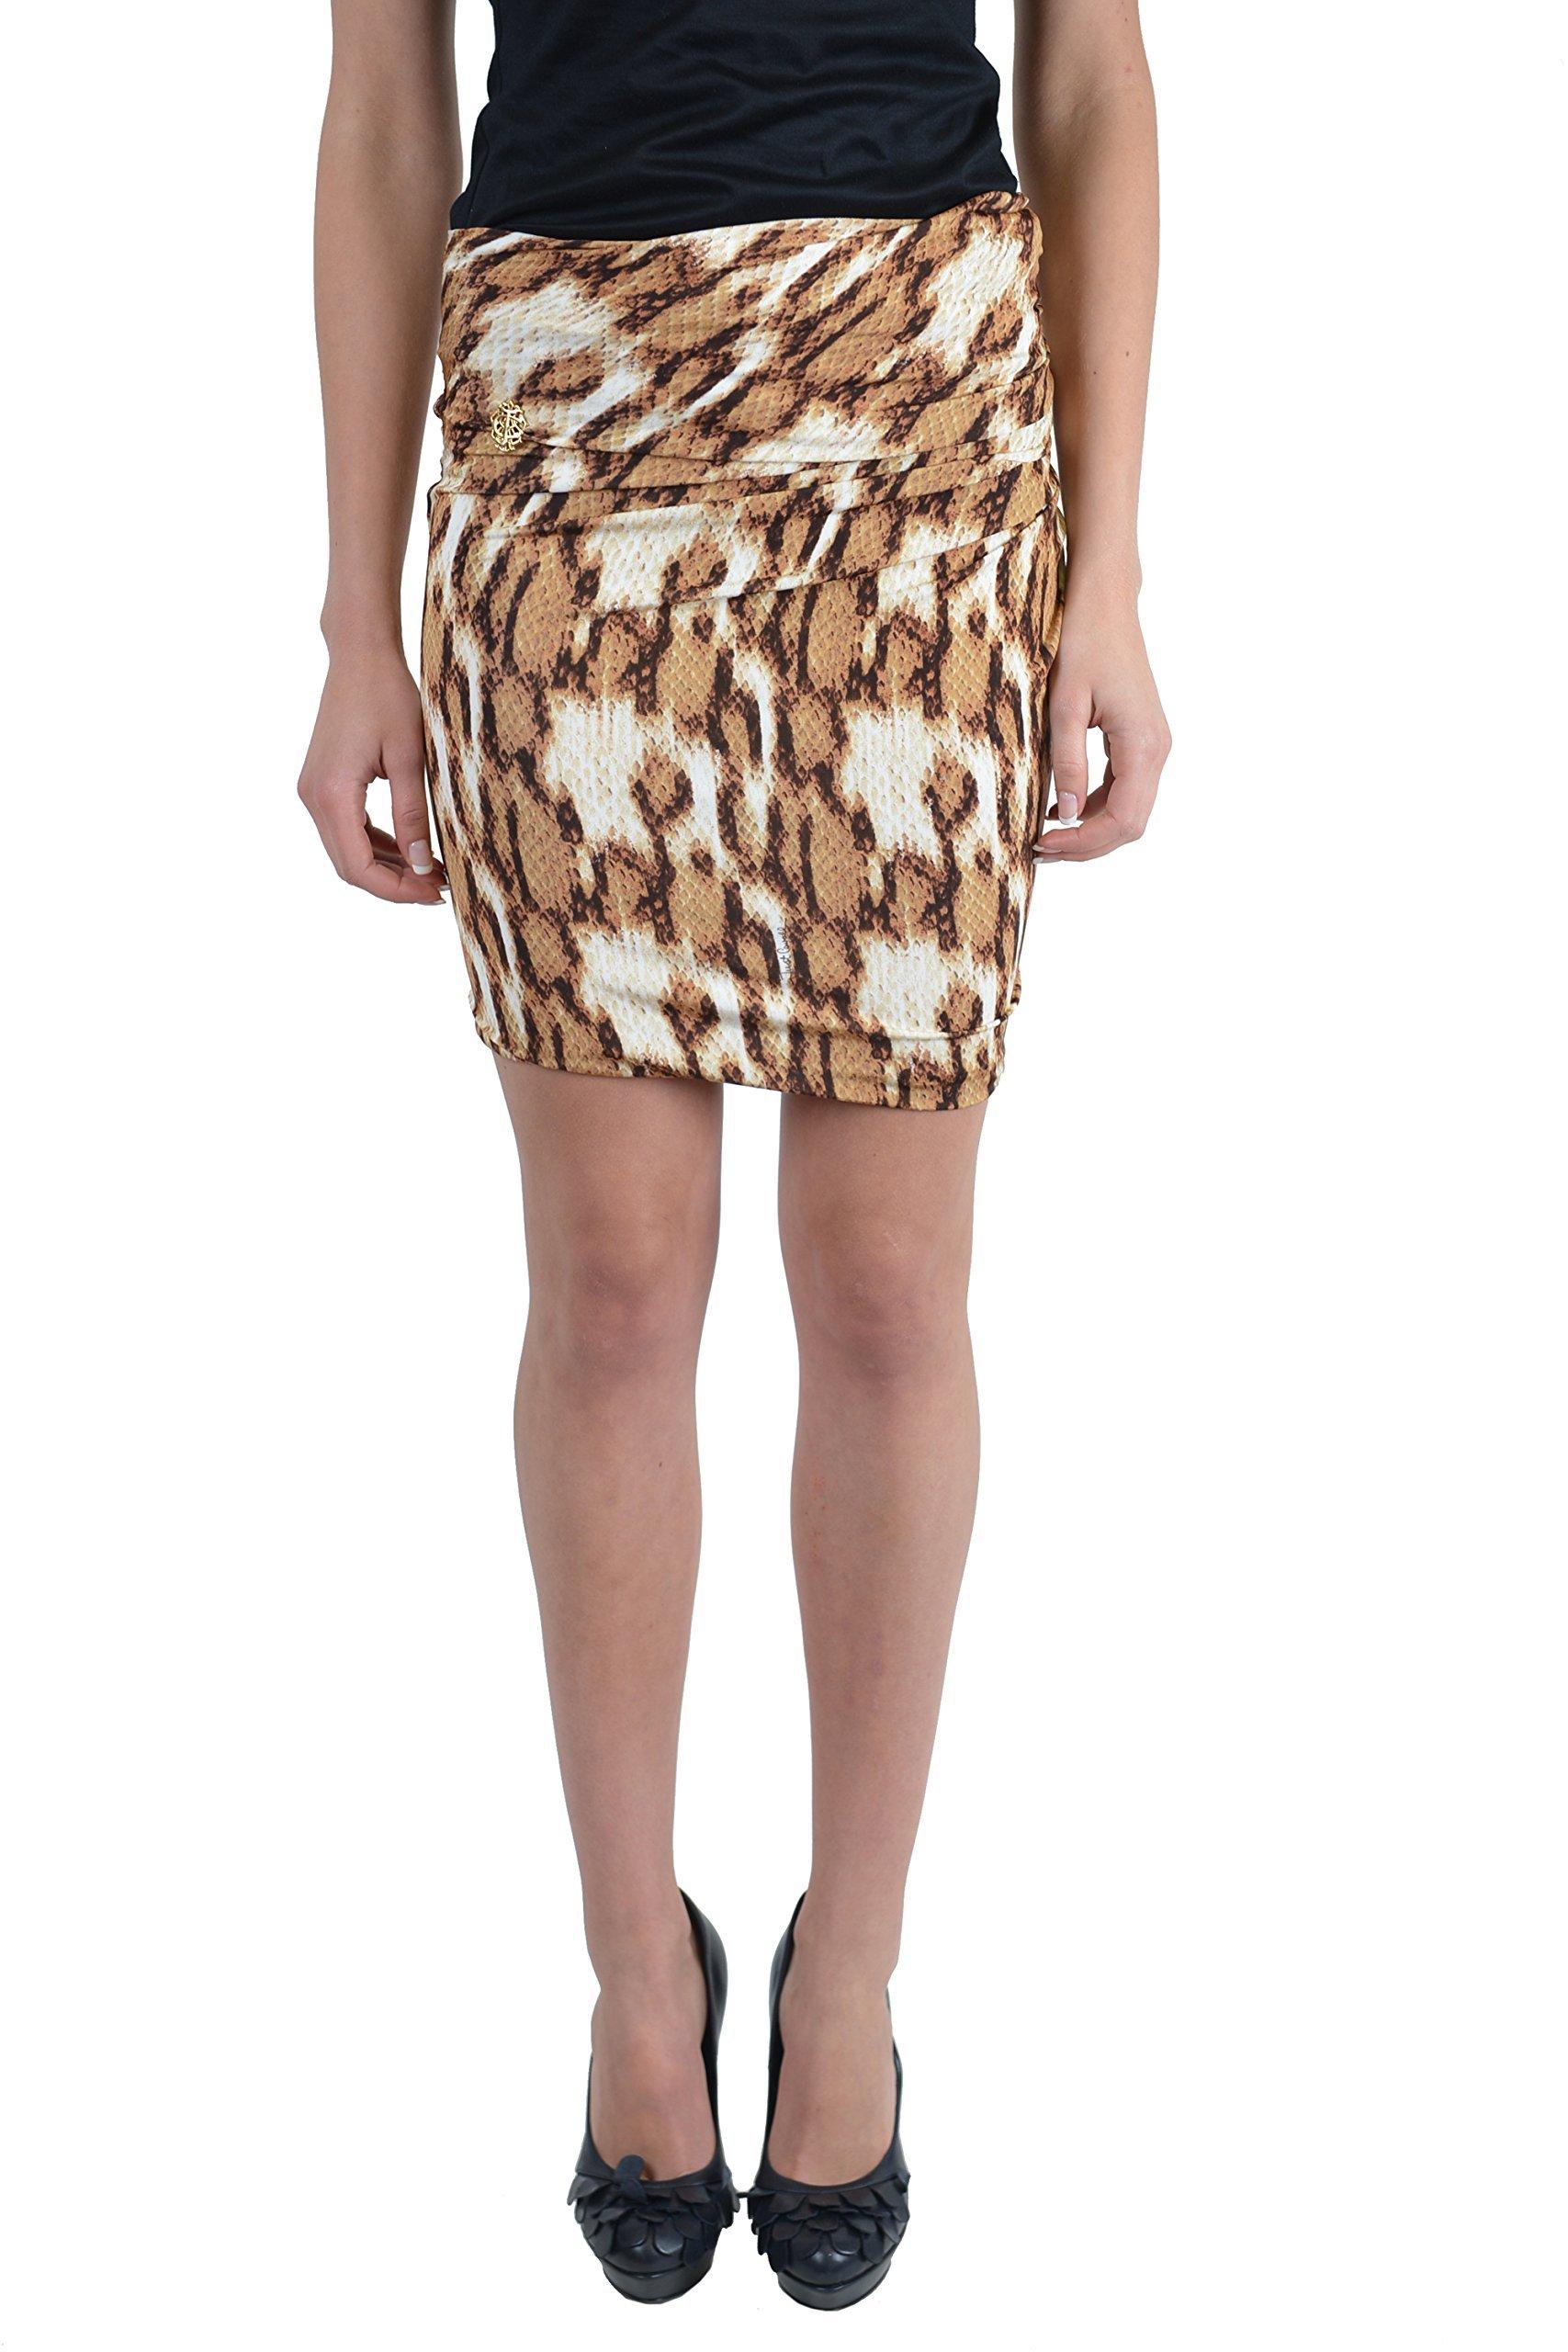 Just Cavalli Women's Stretch Mini Skirt US 12 / EU 48 Multi-Color